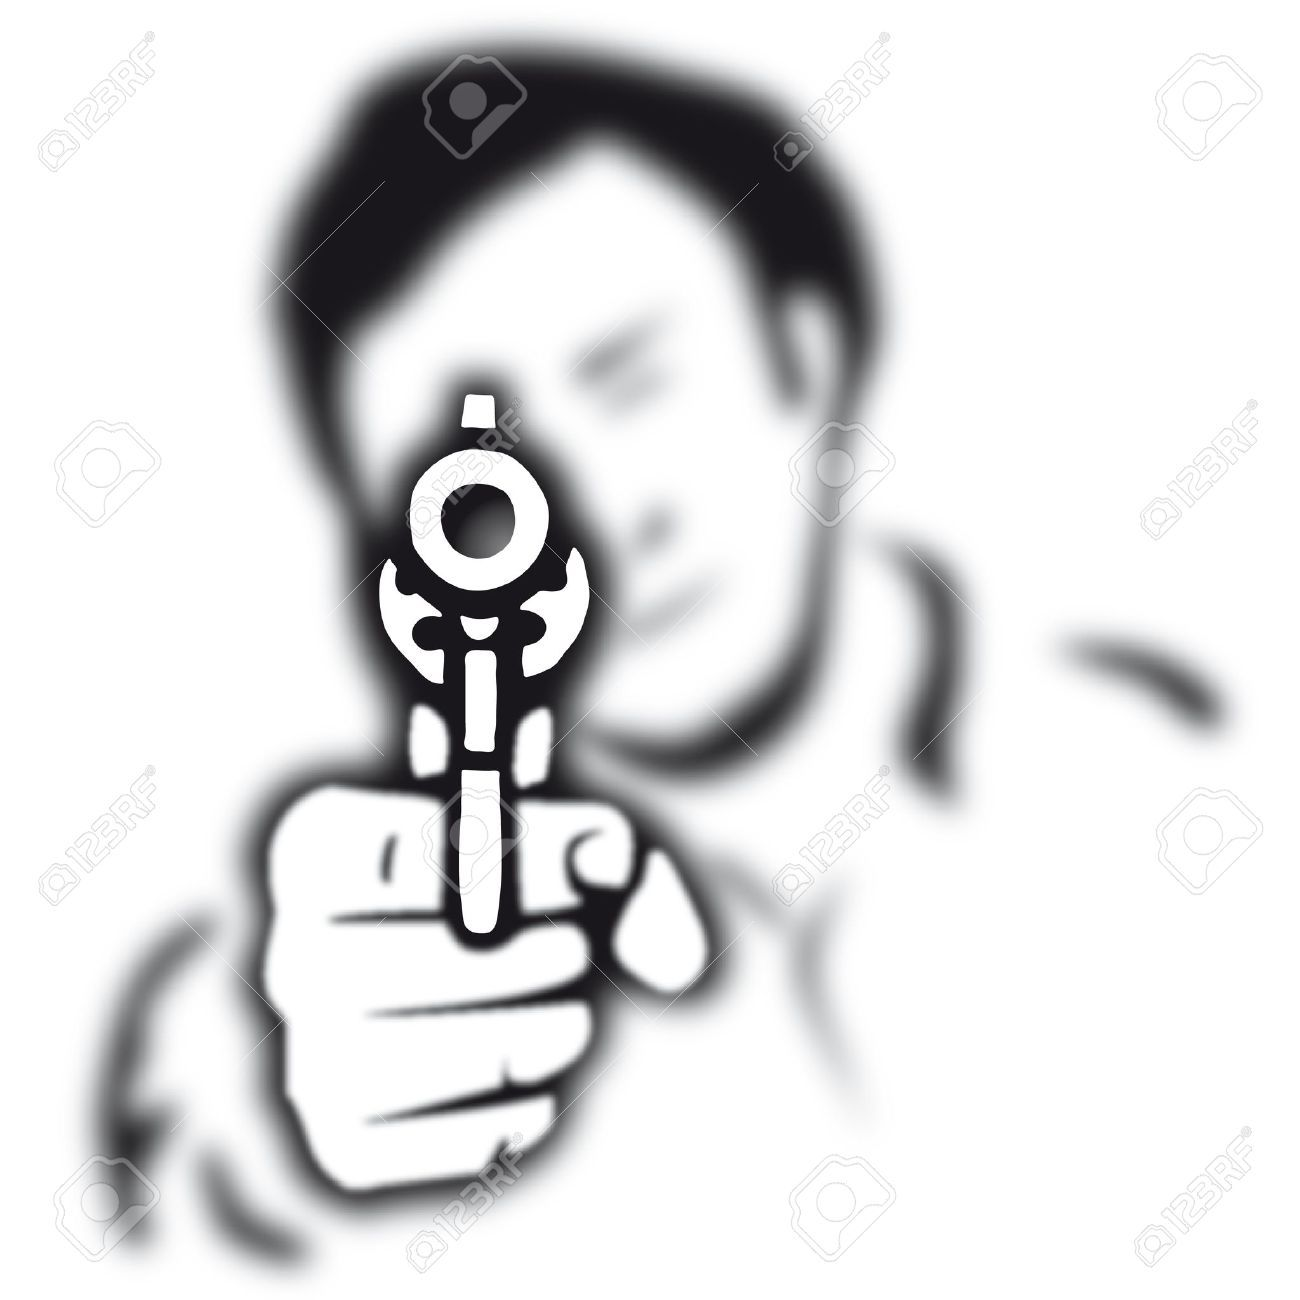 medium resolution of images for gun murder clipart